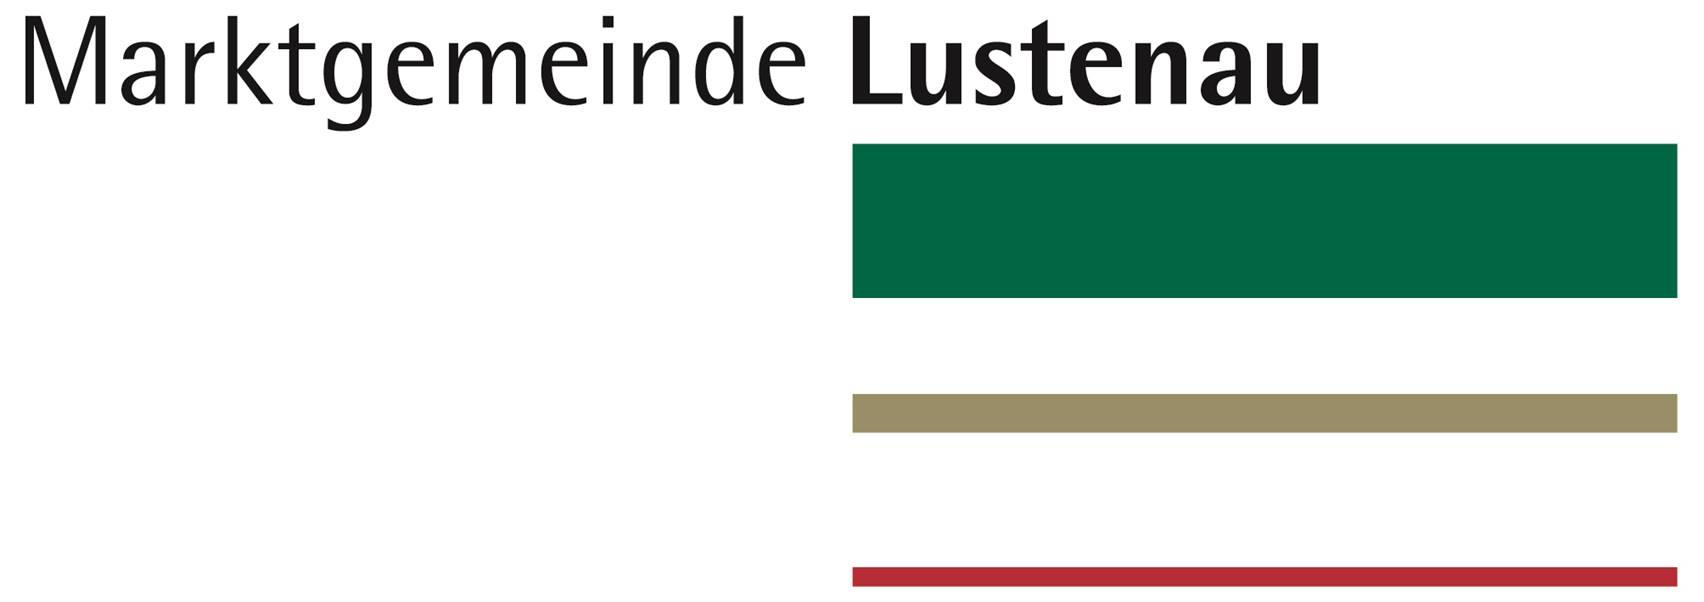 MarktgemeindeLustenau_Logo